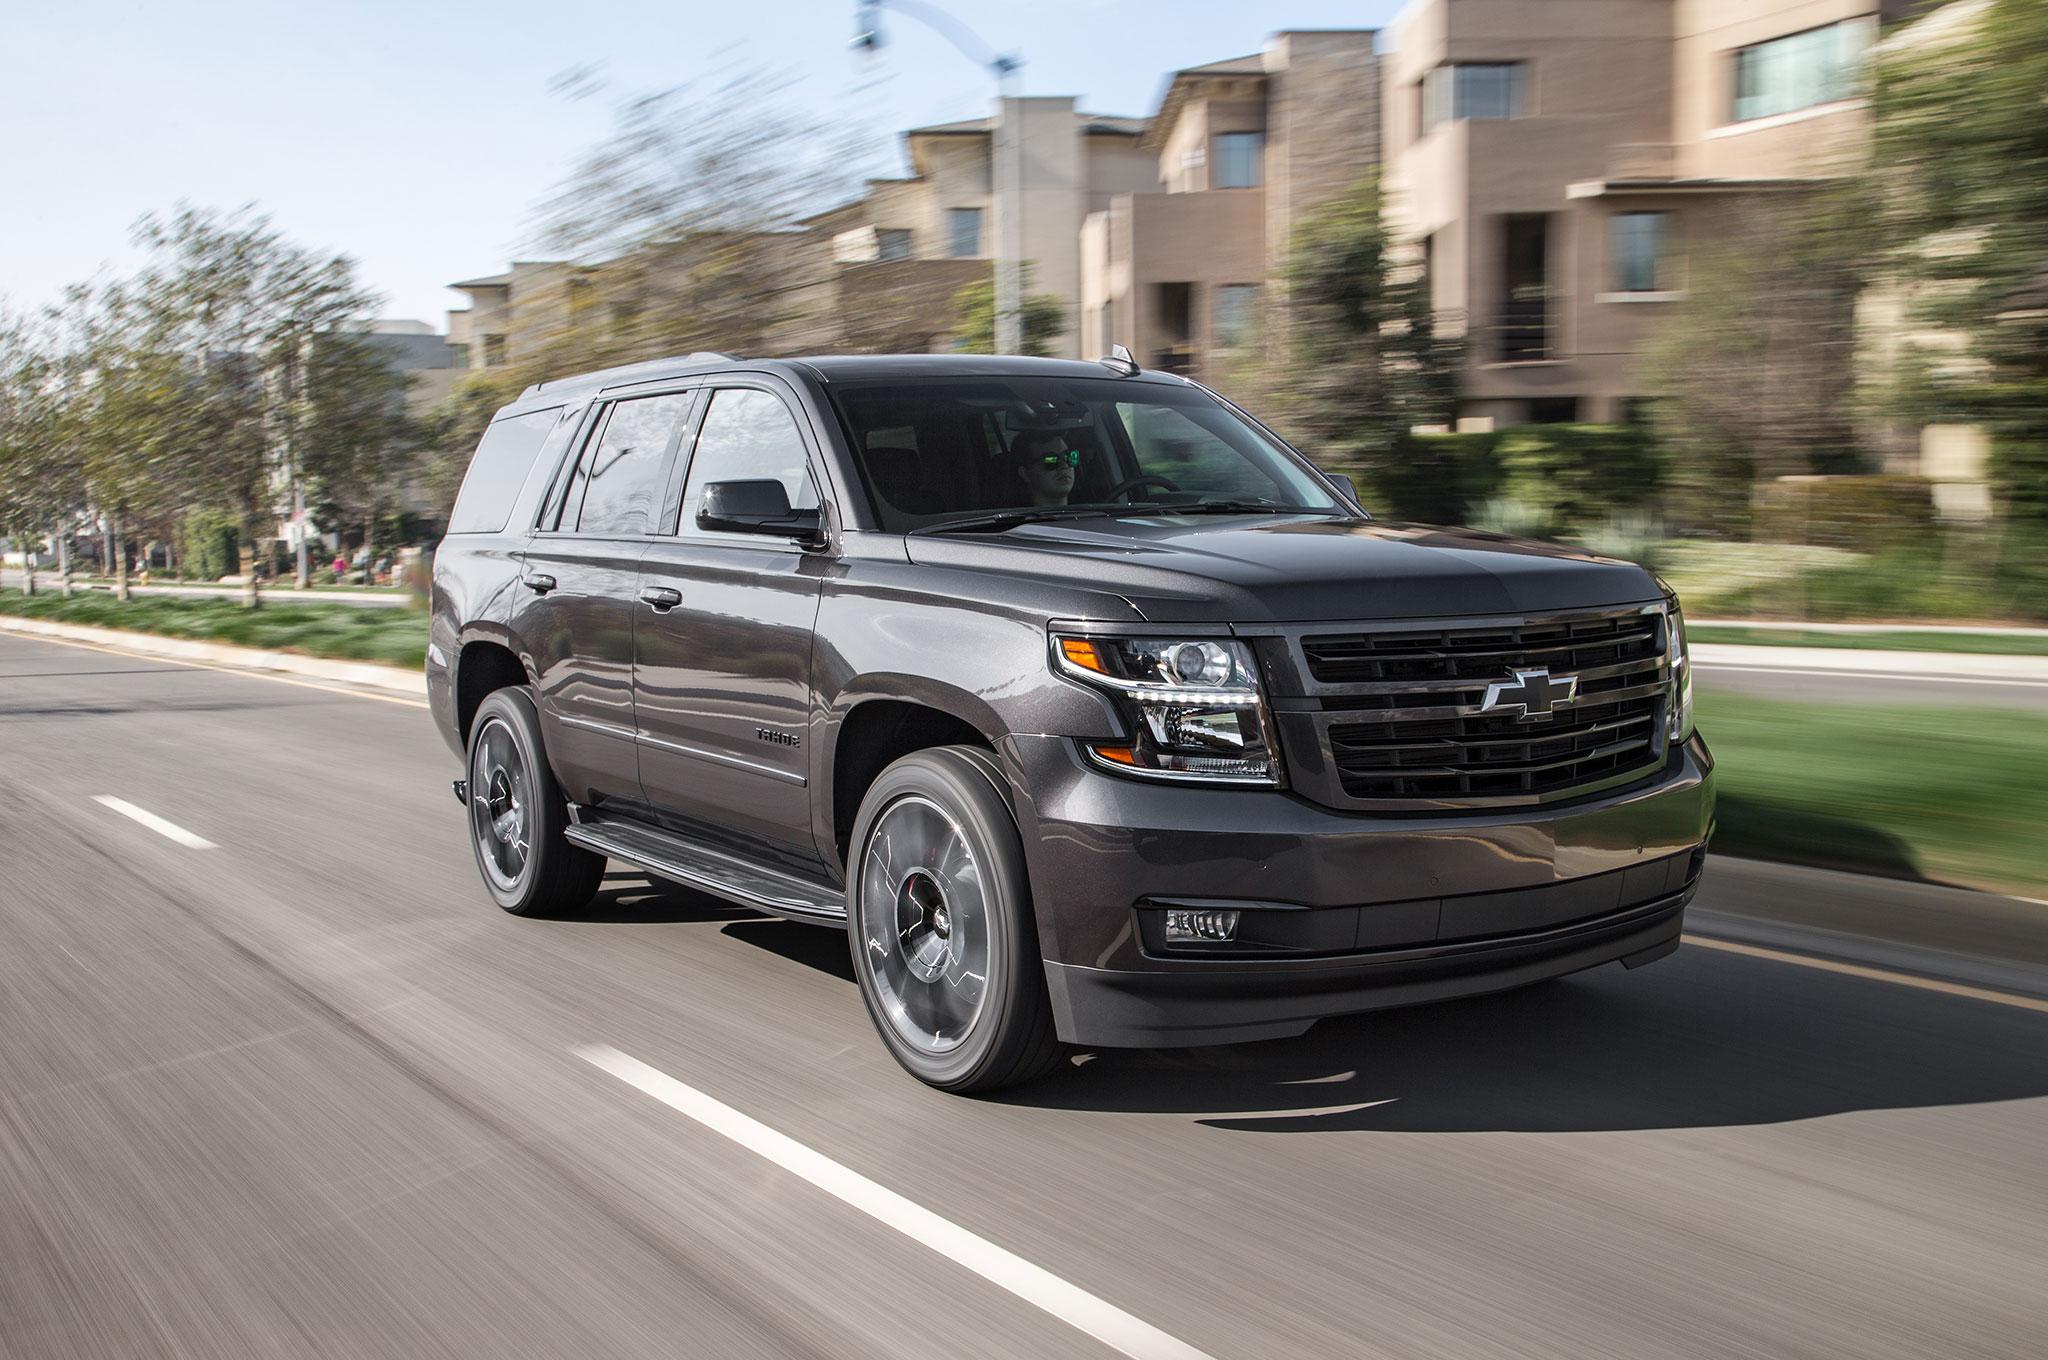 Custom Chevy Tahoe >> 2018 Chevrolet Tahoe Custom Edition Starts at $44,995